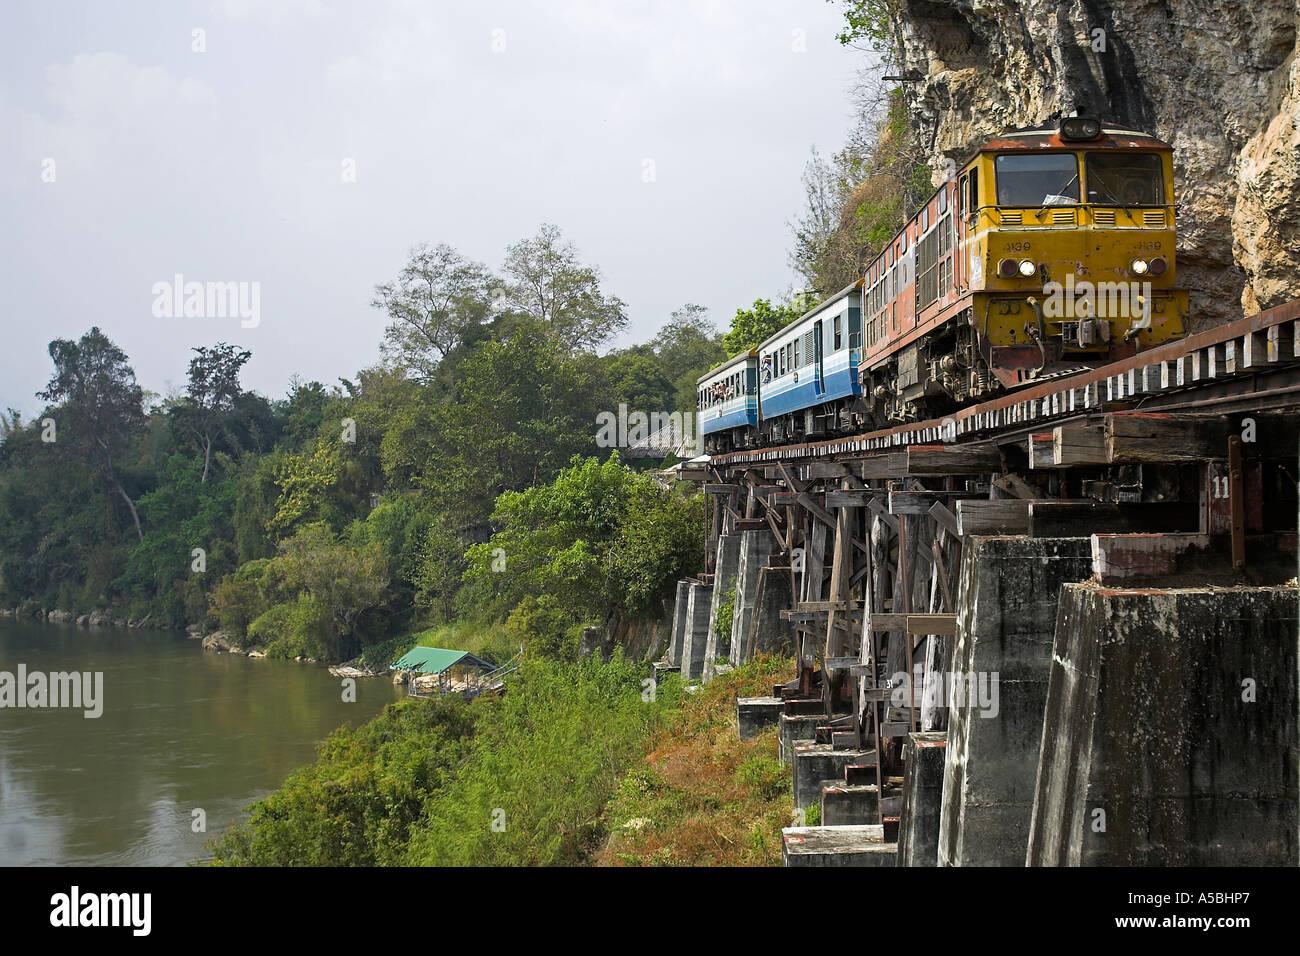 River Kwai and Burma Railway tourist train on Krasae Cave trestle railway viaduct bridge Thailand - Stock Image